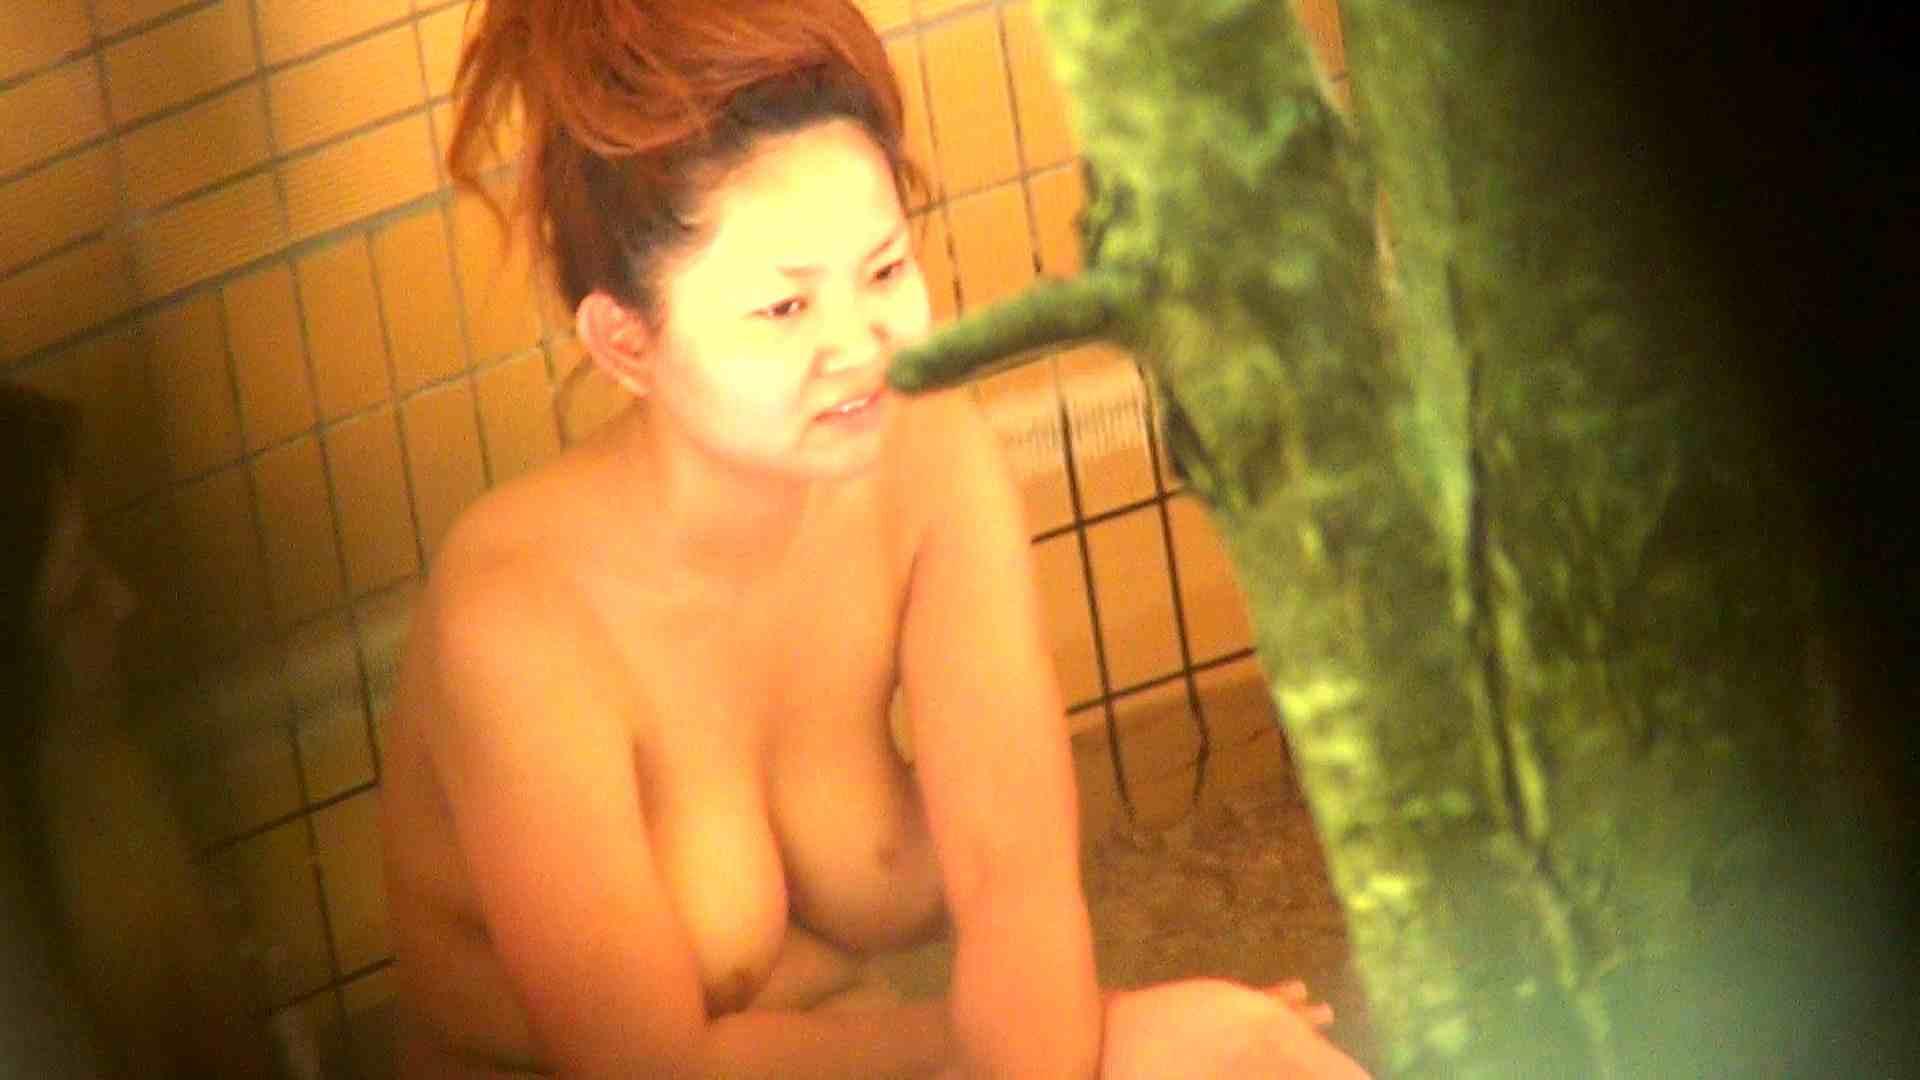 Aquaな露天風呂Vol.267 盗撮   HなOL  91pic 84